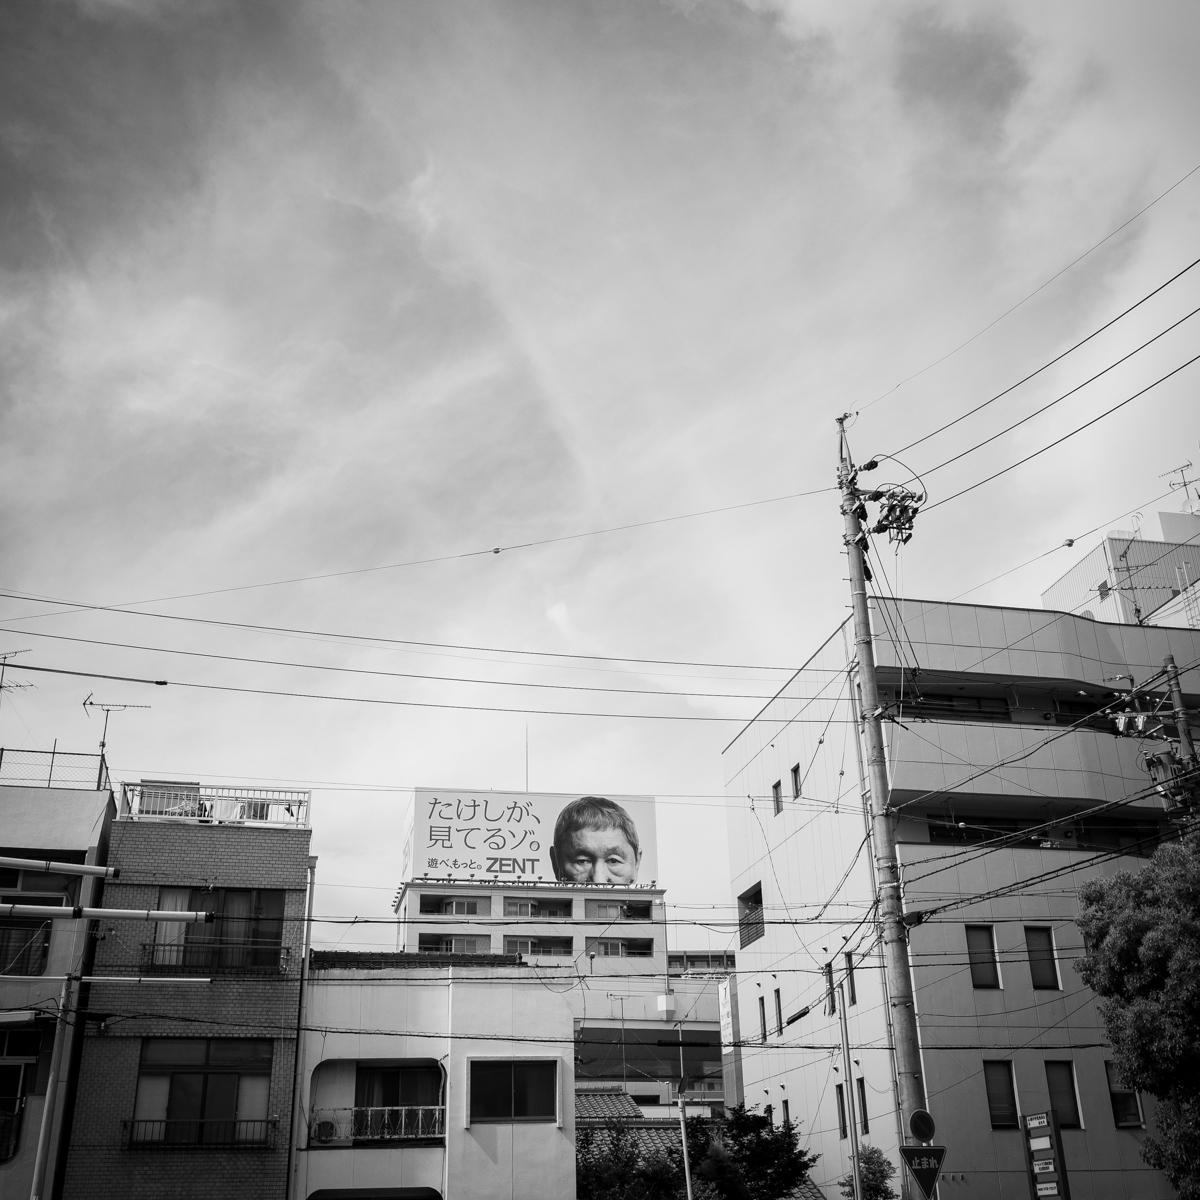 f:id:nagoya-meshi:20190611221205j:plain